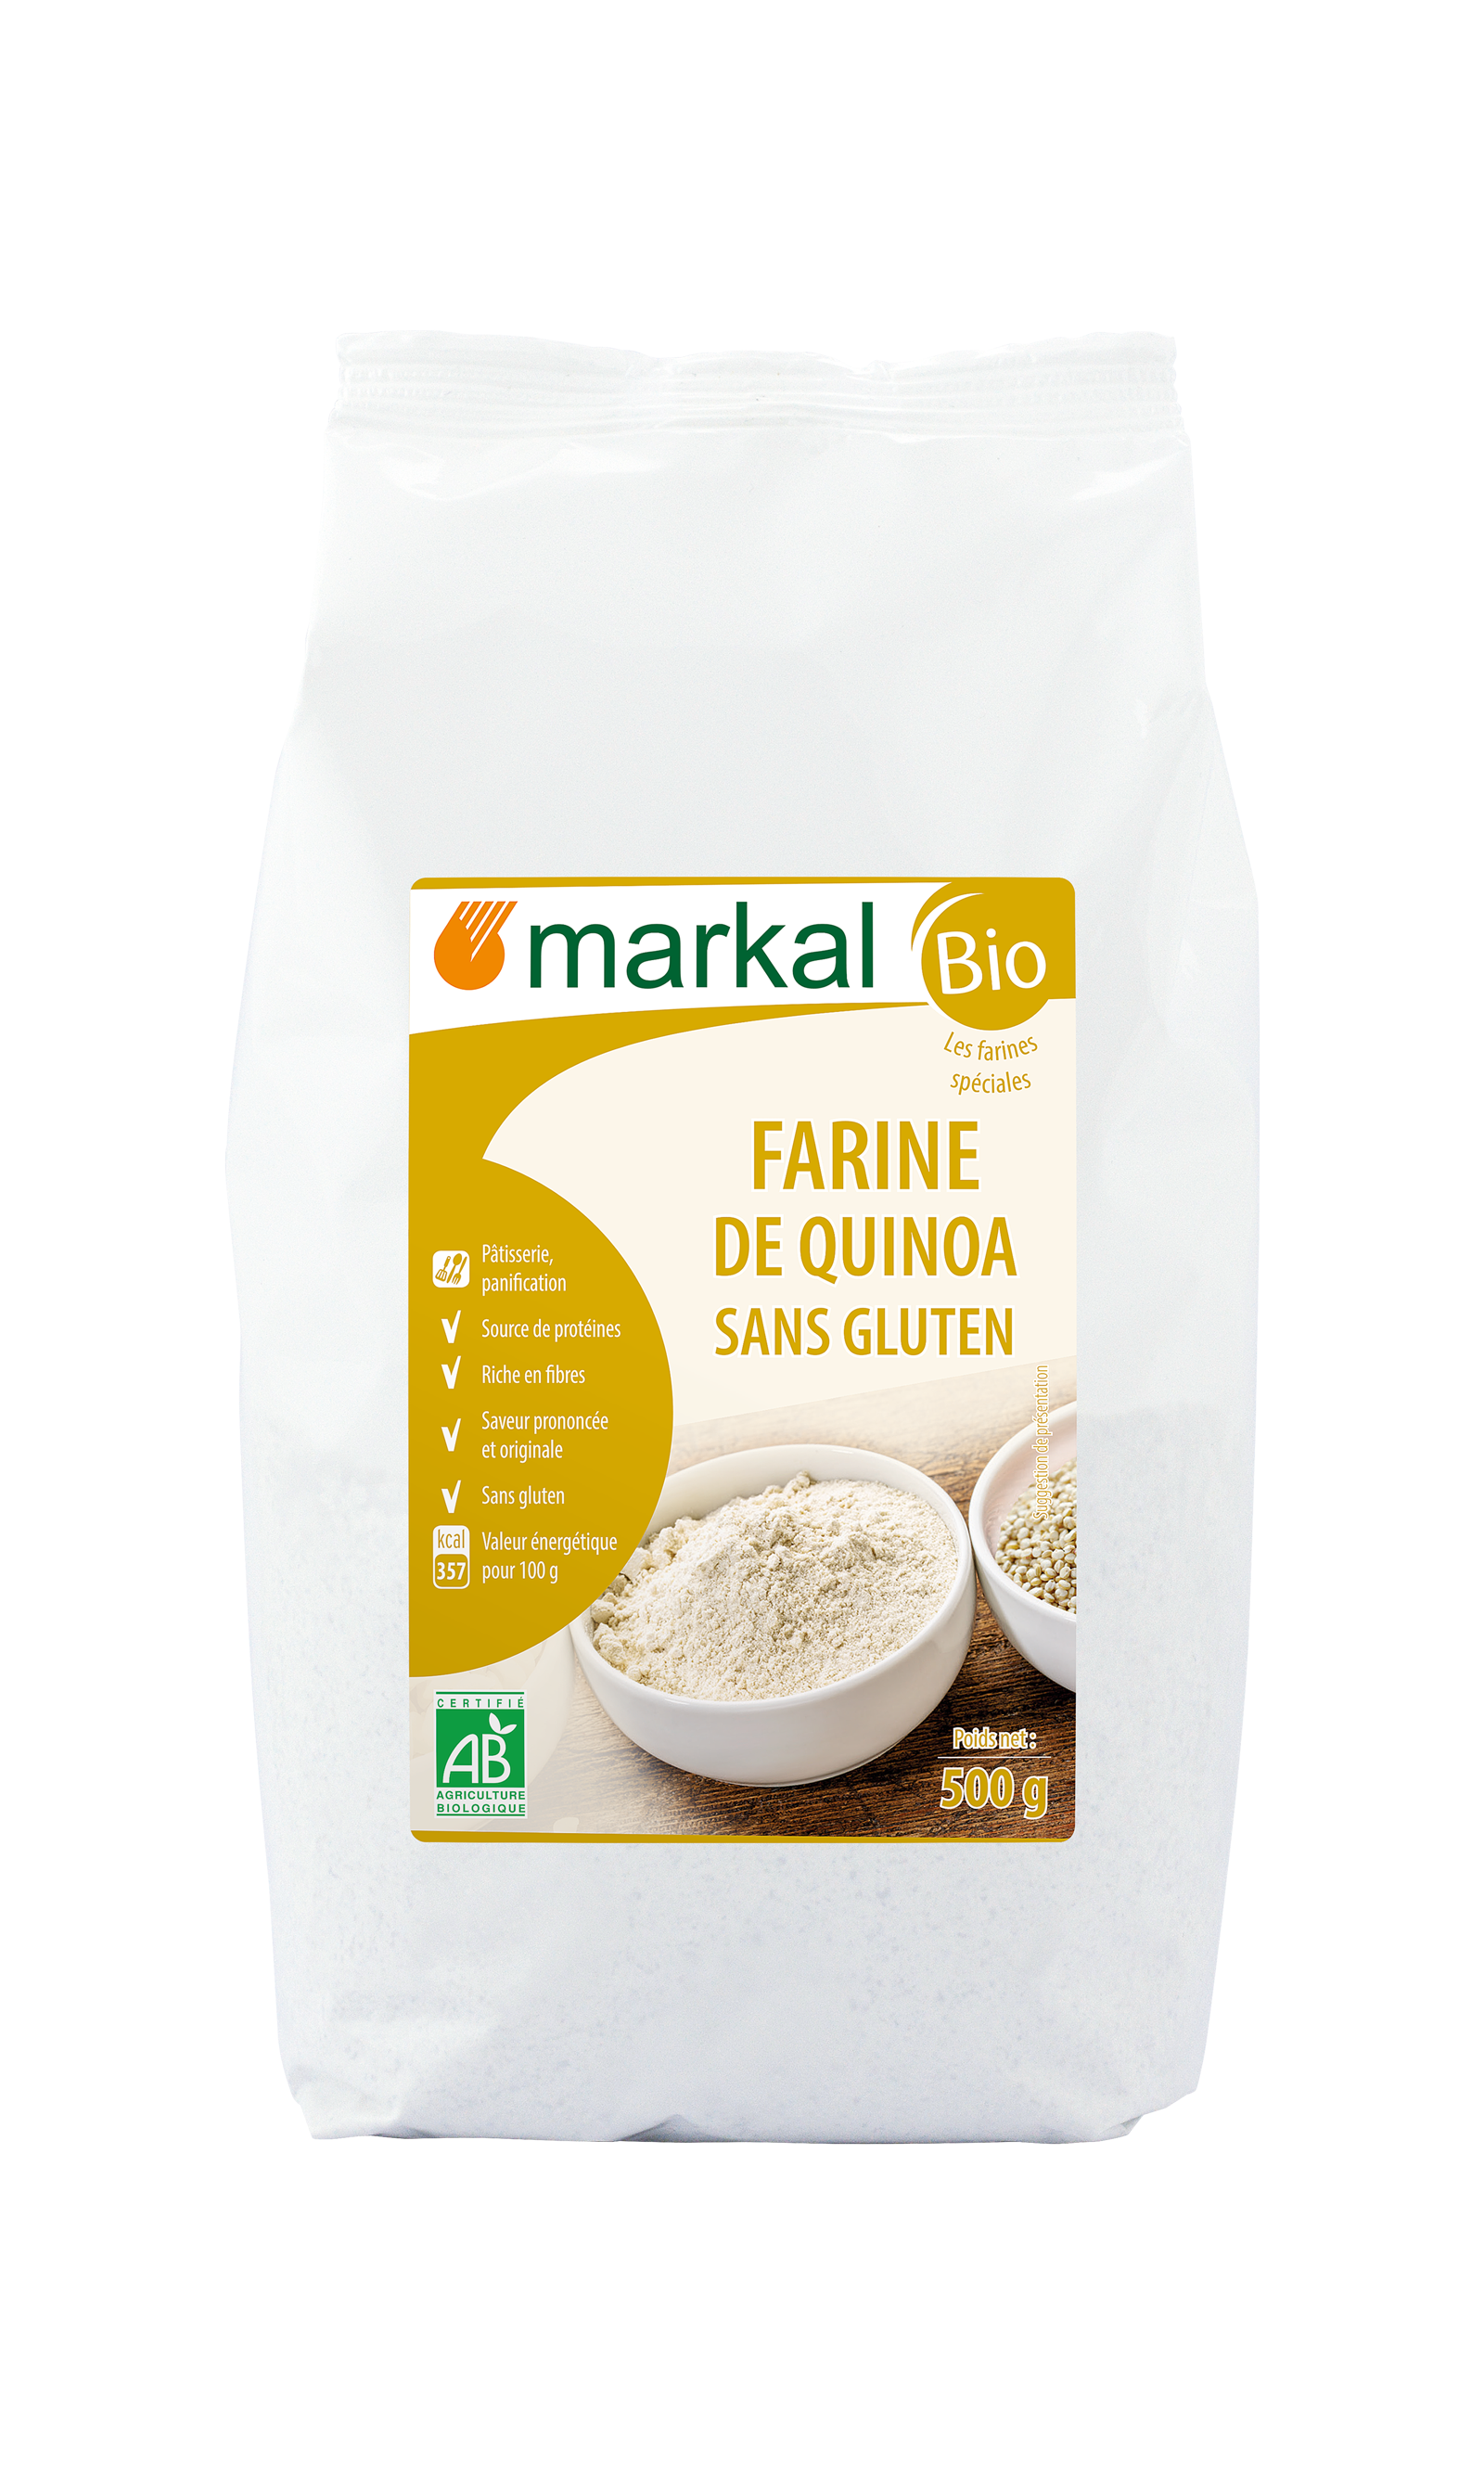 Farine de quinoa - sans gluten